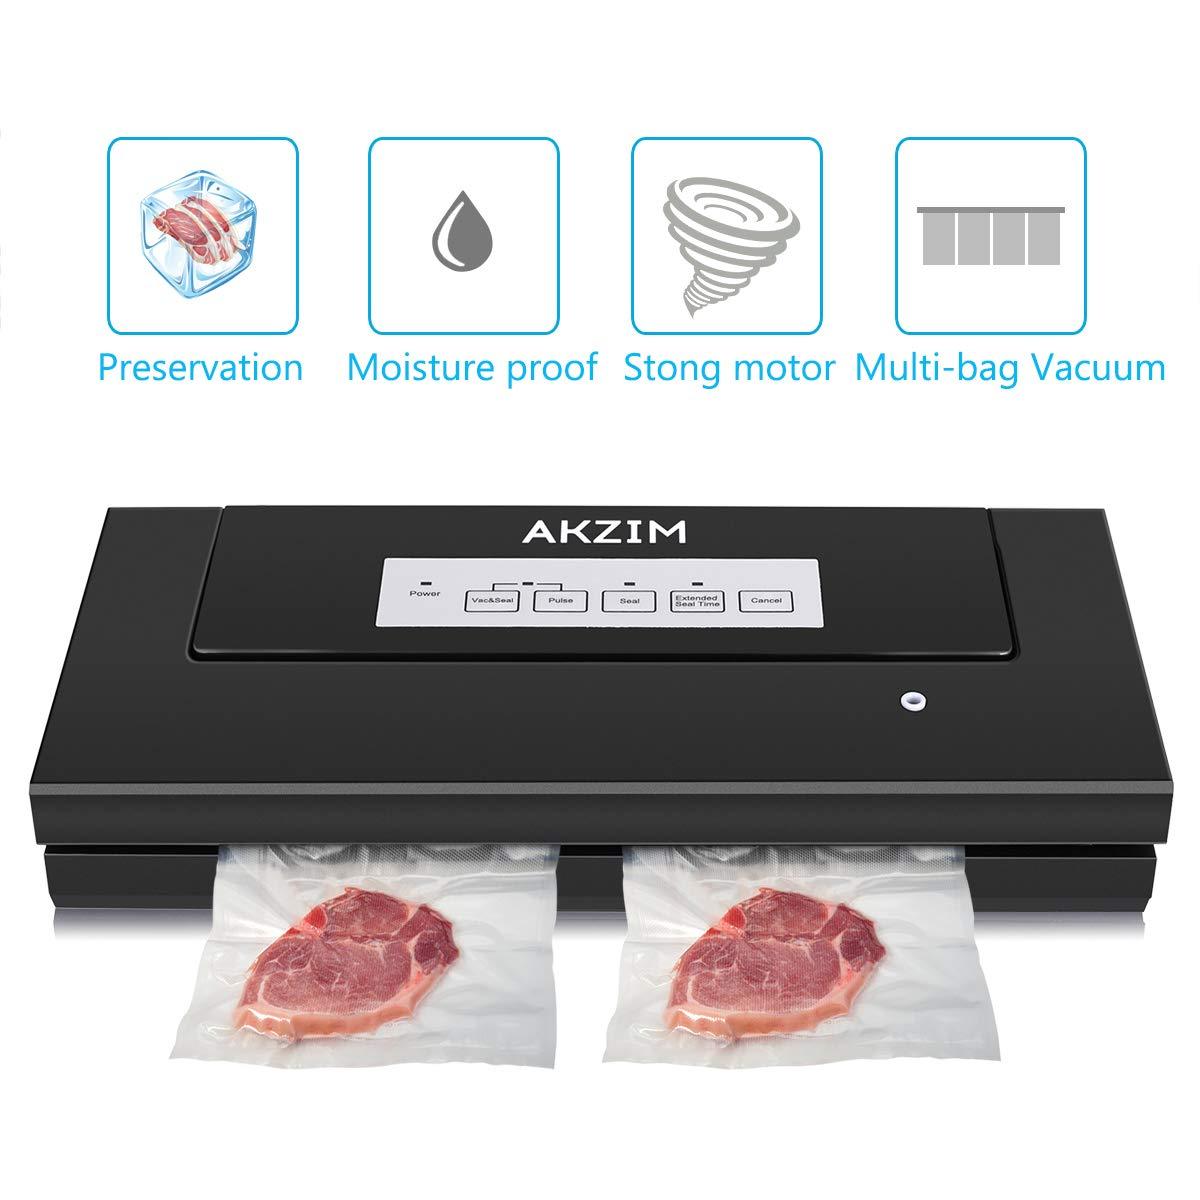 Sous Vide Vacuum Sealer, Akzim Automatic Food Vacuum Sealer Machine with 10 Vacuum Sealer Bags,Multi-use Vacuum Packing Machine for Food Preservation(black)